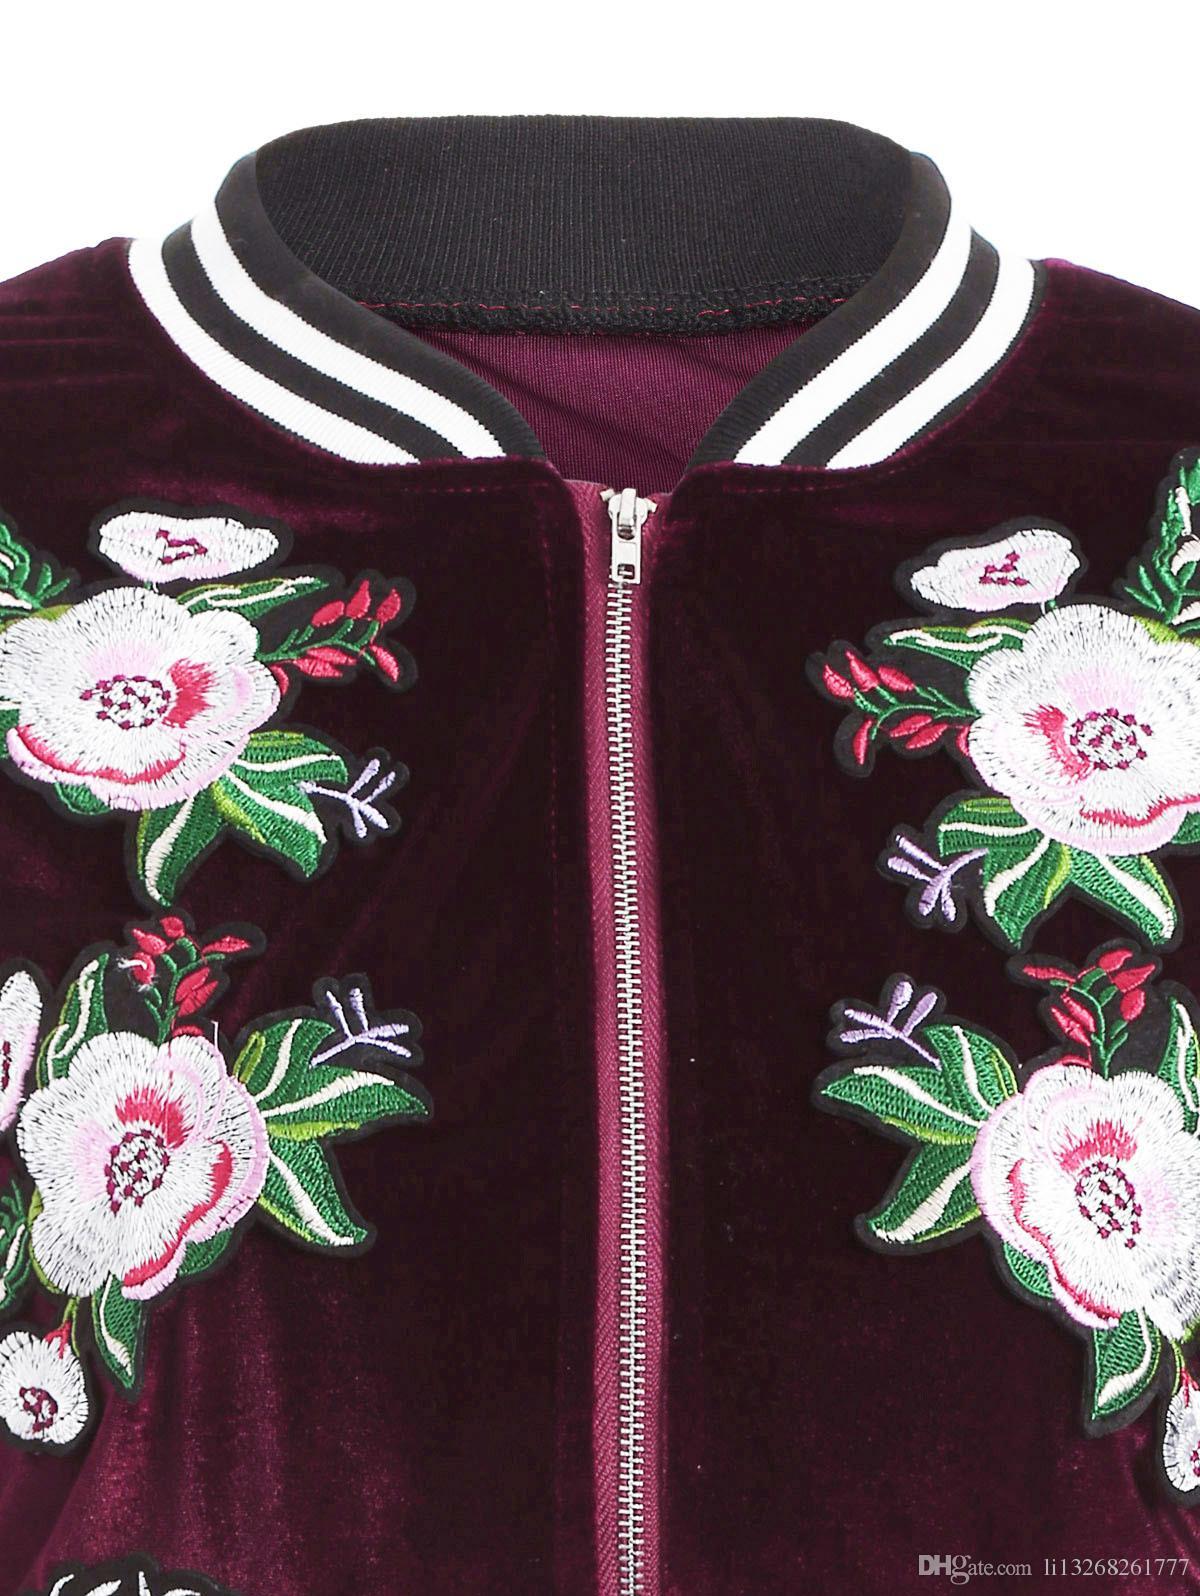 Women's Clothing Women tiger rose flowers embroidery Decals velvet tops short jacket Women's Outerwear & Coats